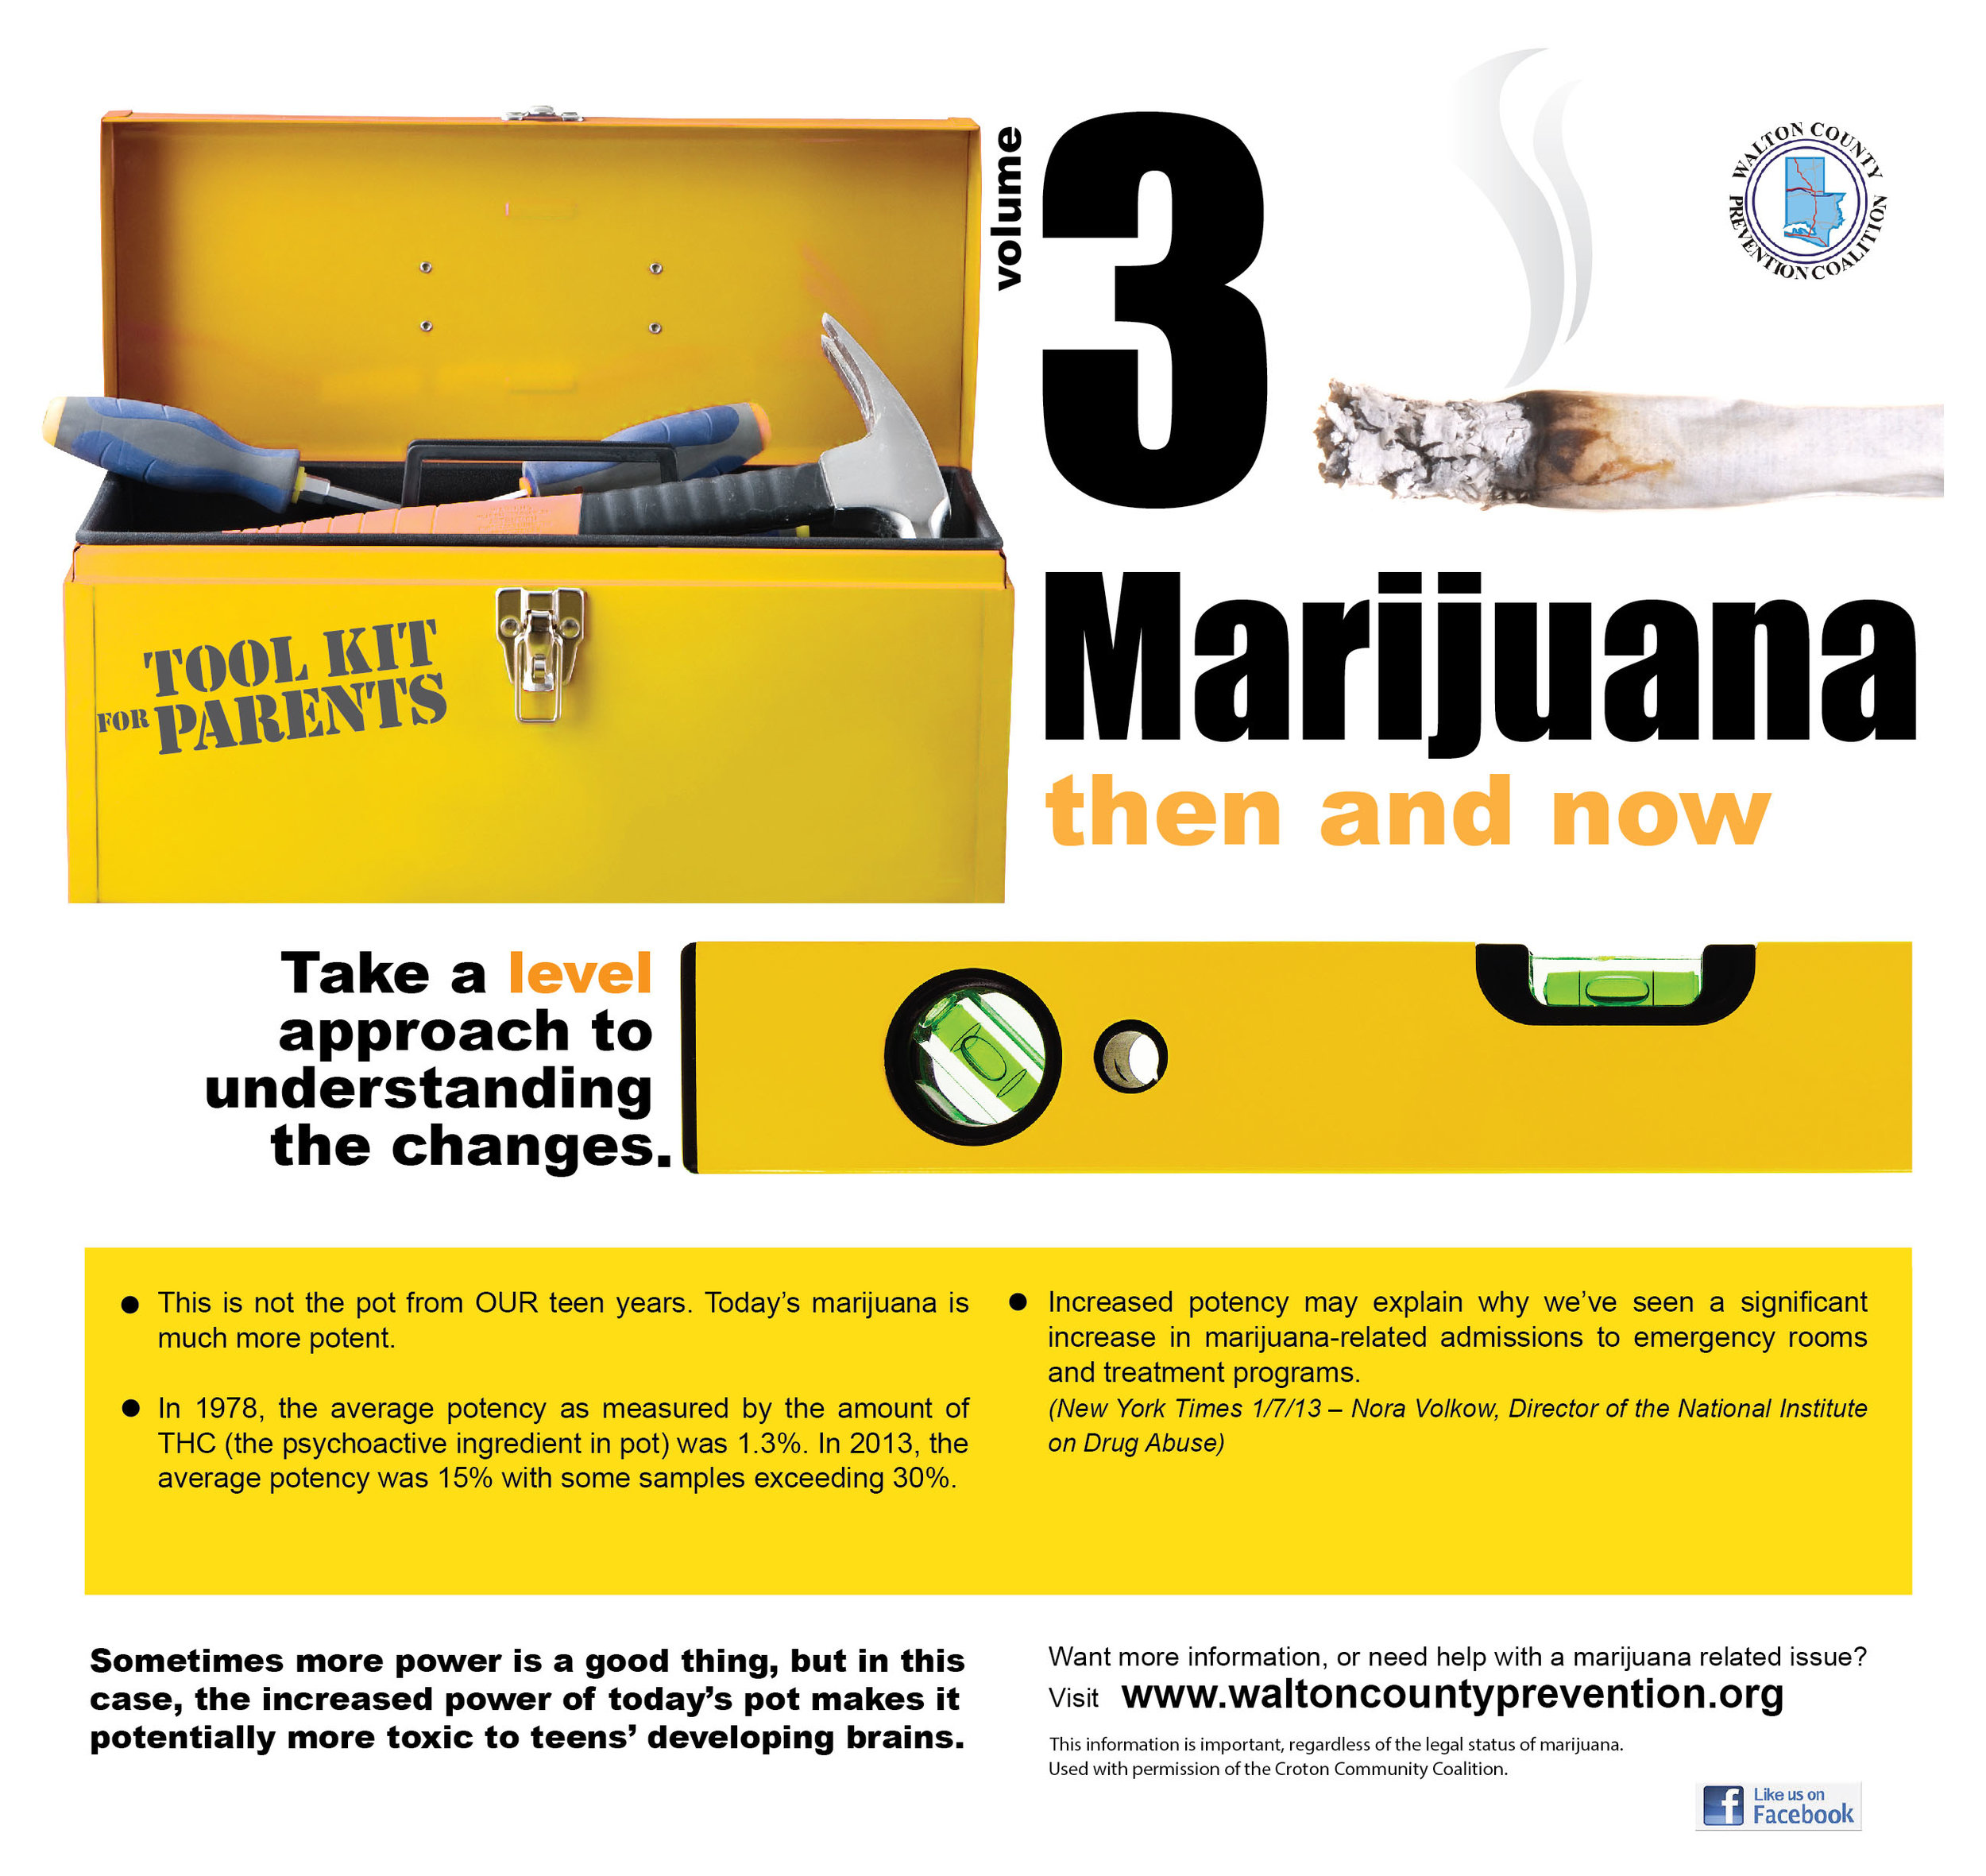 16 Marijuana card 3 one sided.jpg